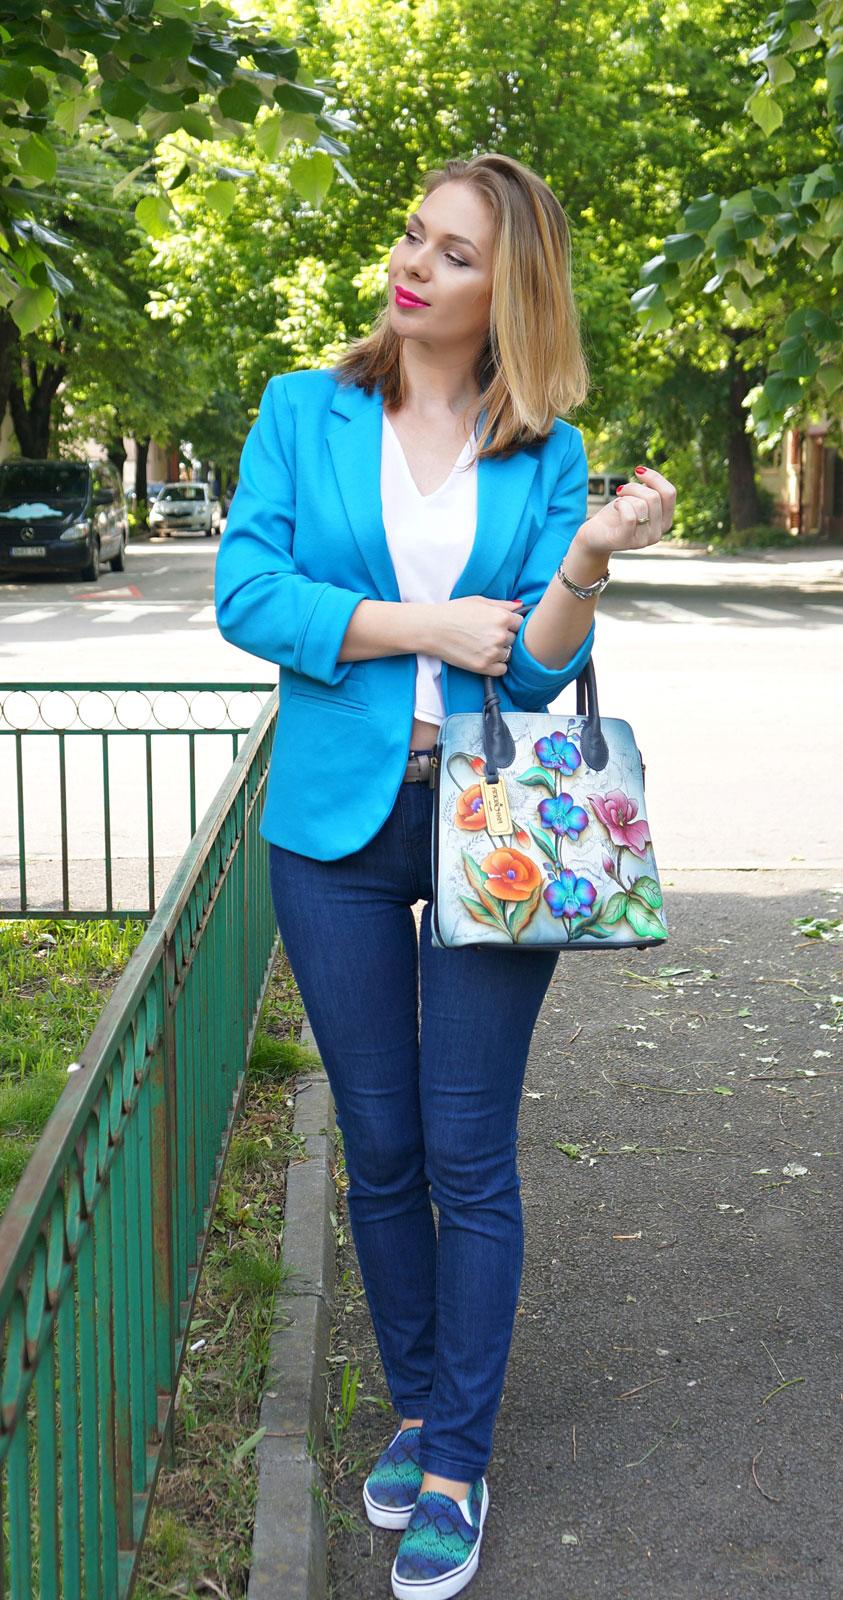 street.style.outfit.federova